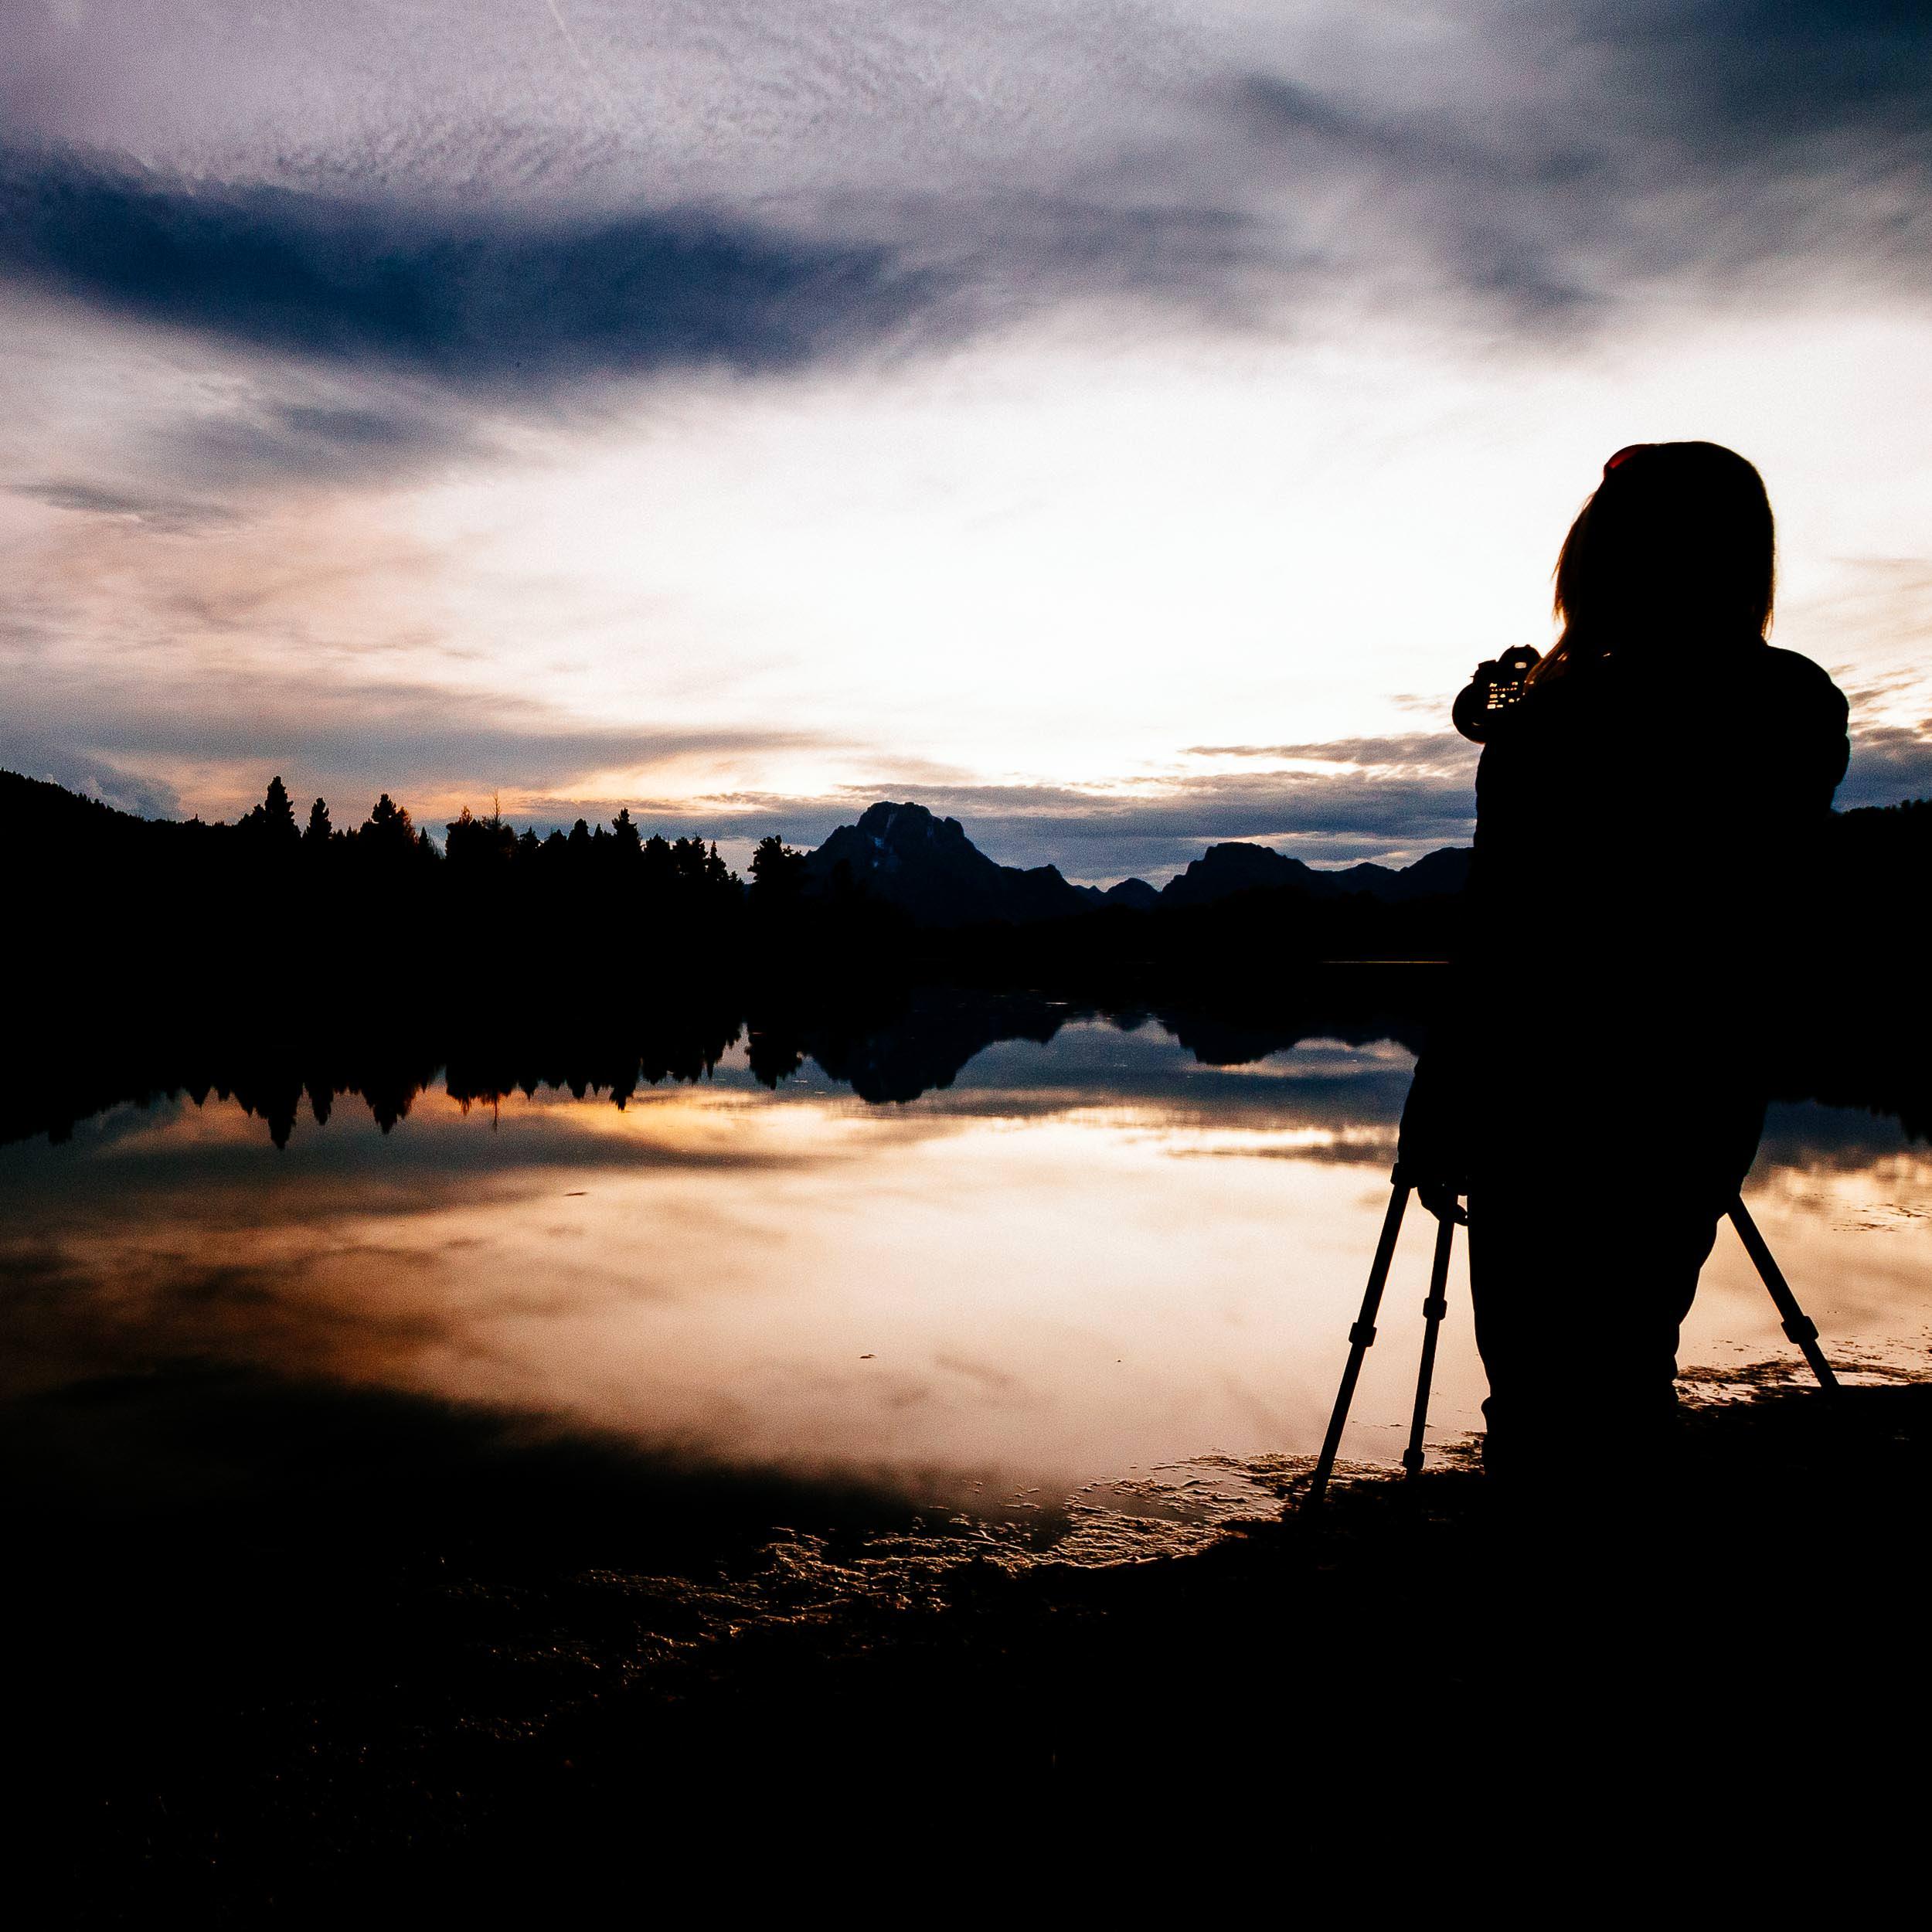 Teton Photo Adventures - Client photographing through sunset